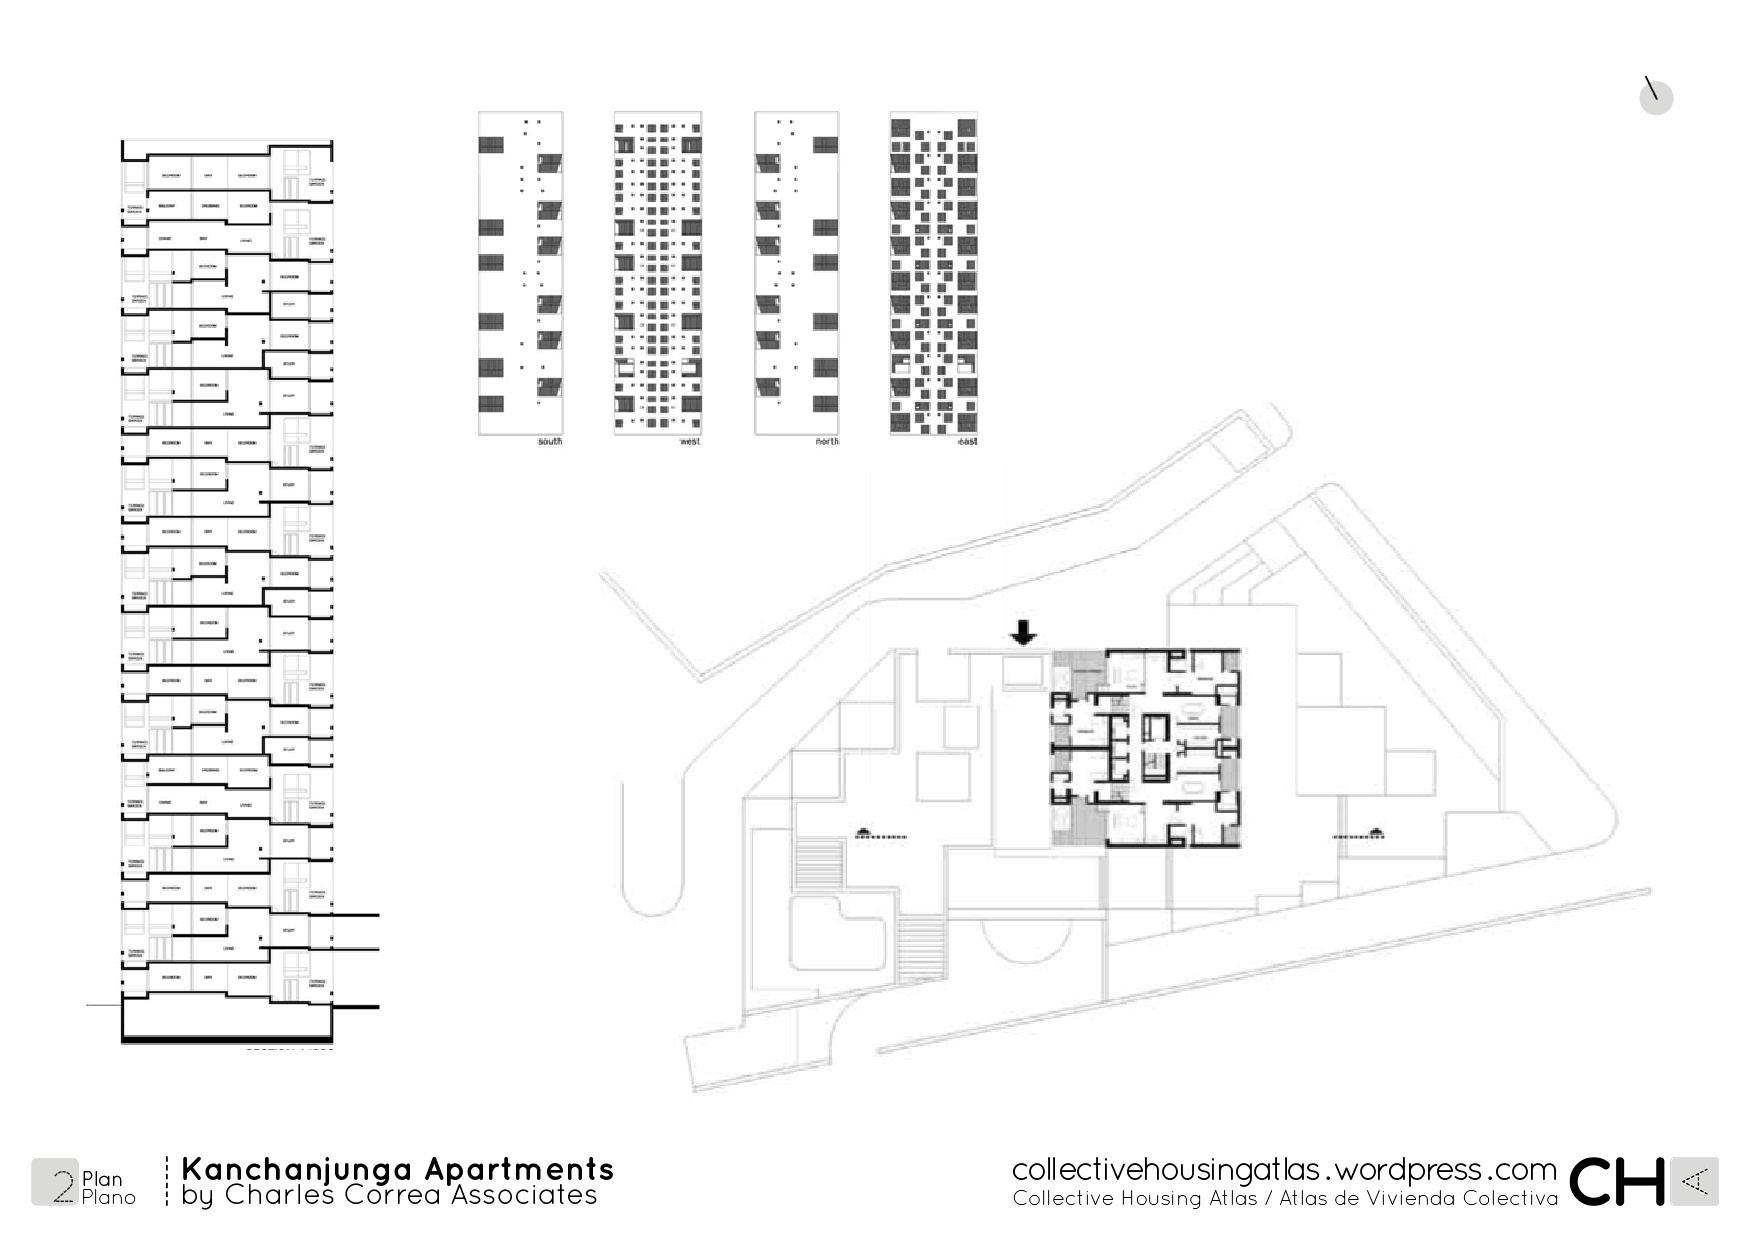 kanchanjunga apartments by charles correa associates